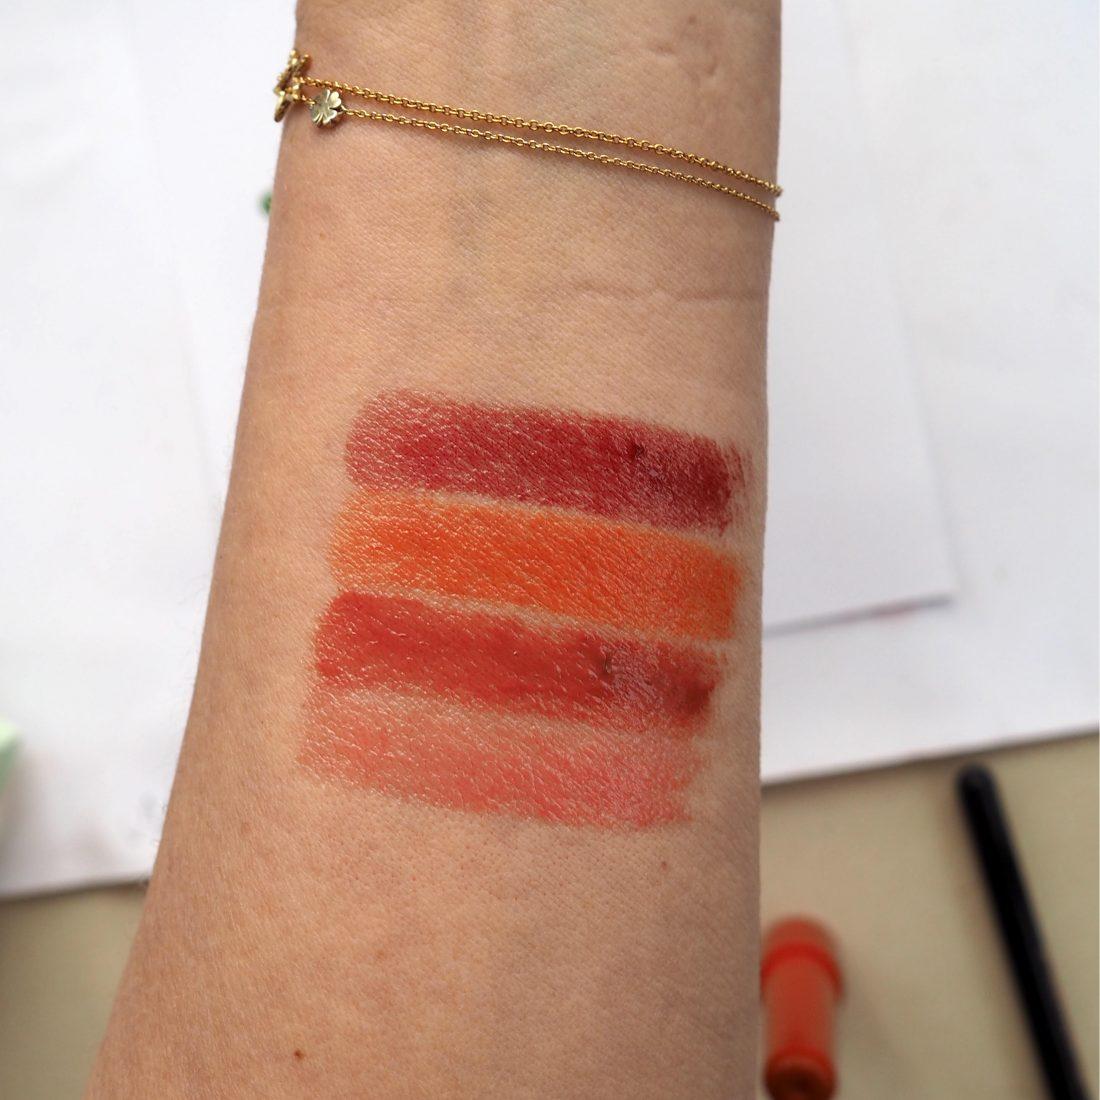 Inc Redible Jammy Lips British Beauty Blogger